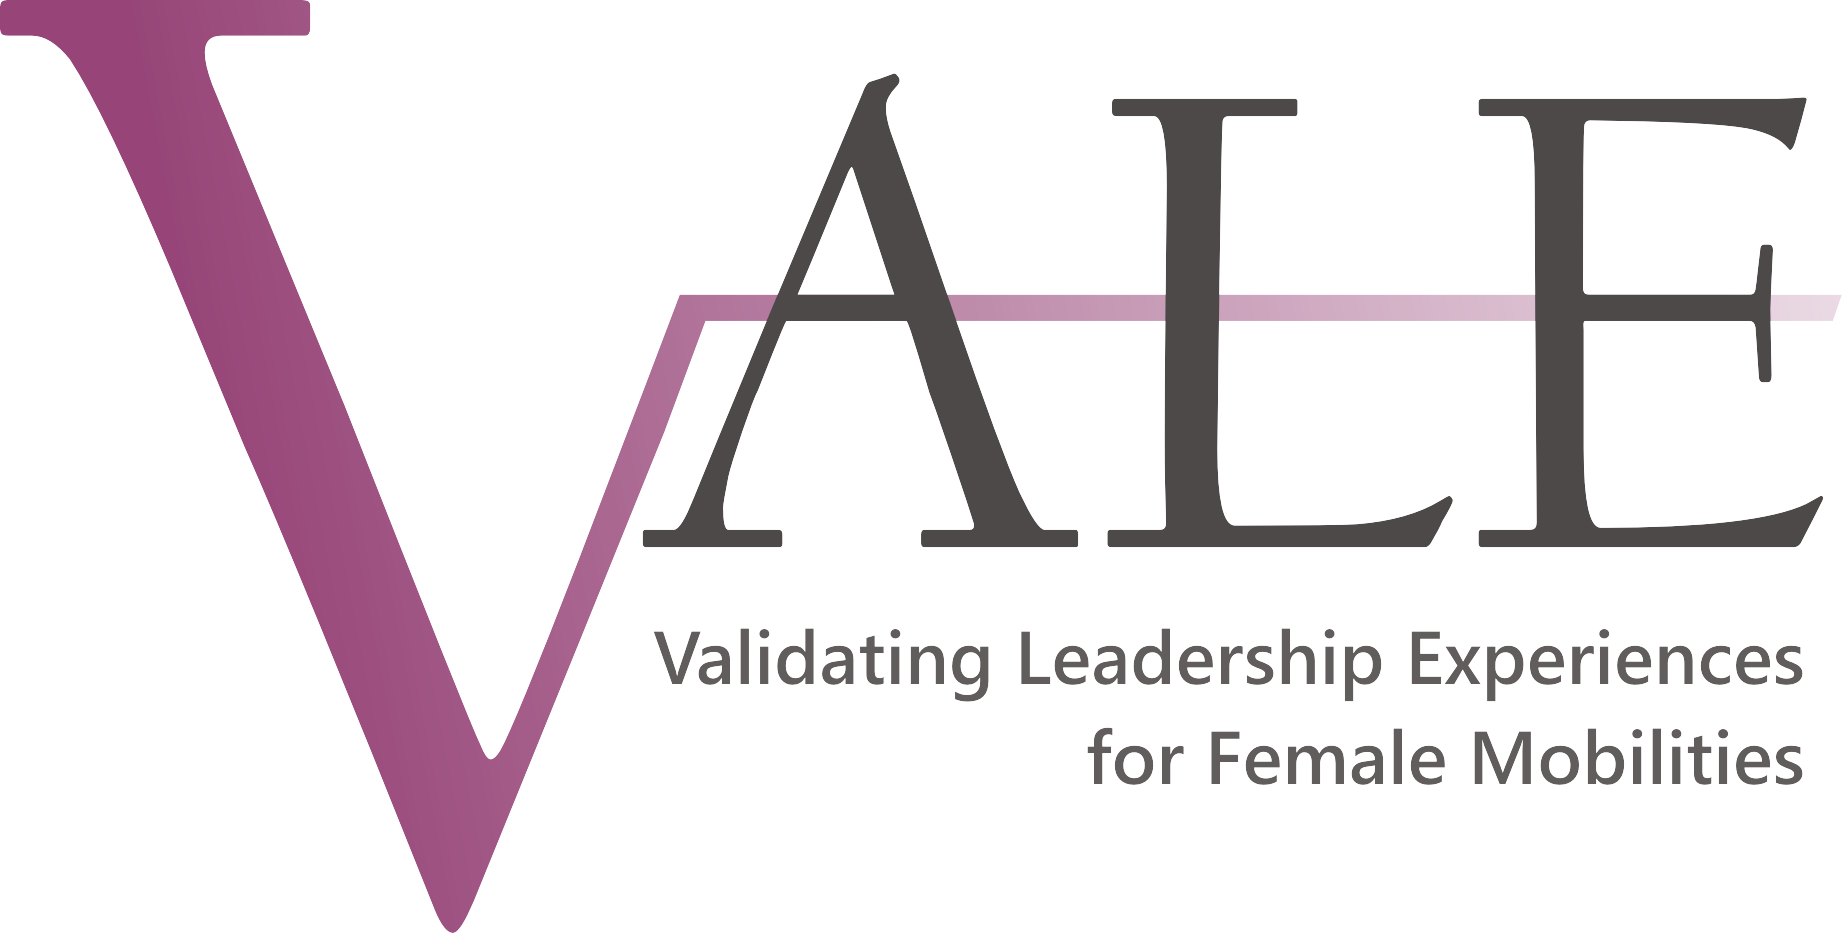 VALE-logo2